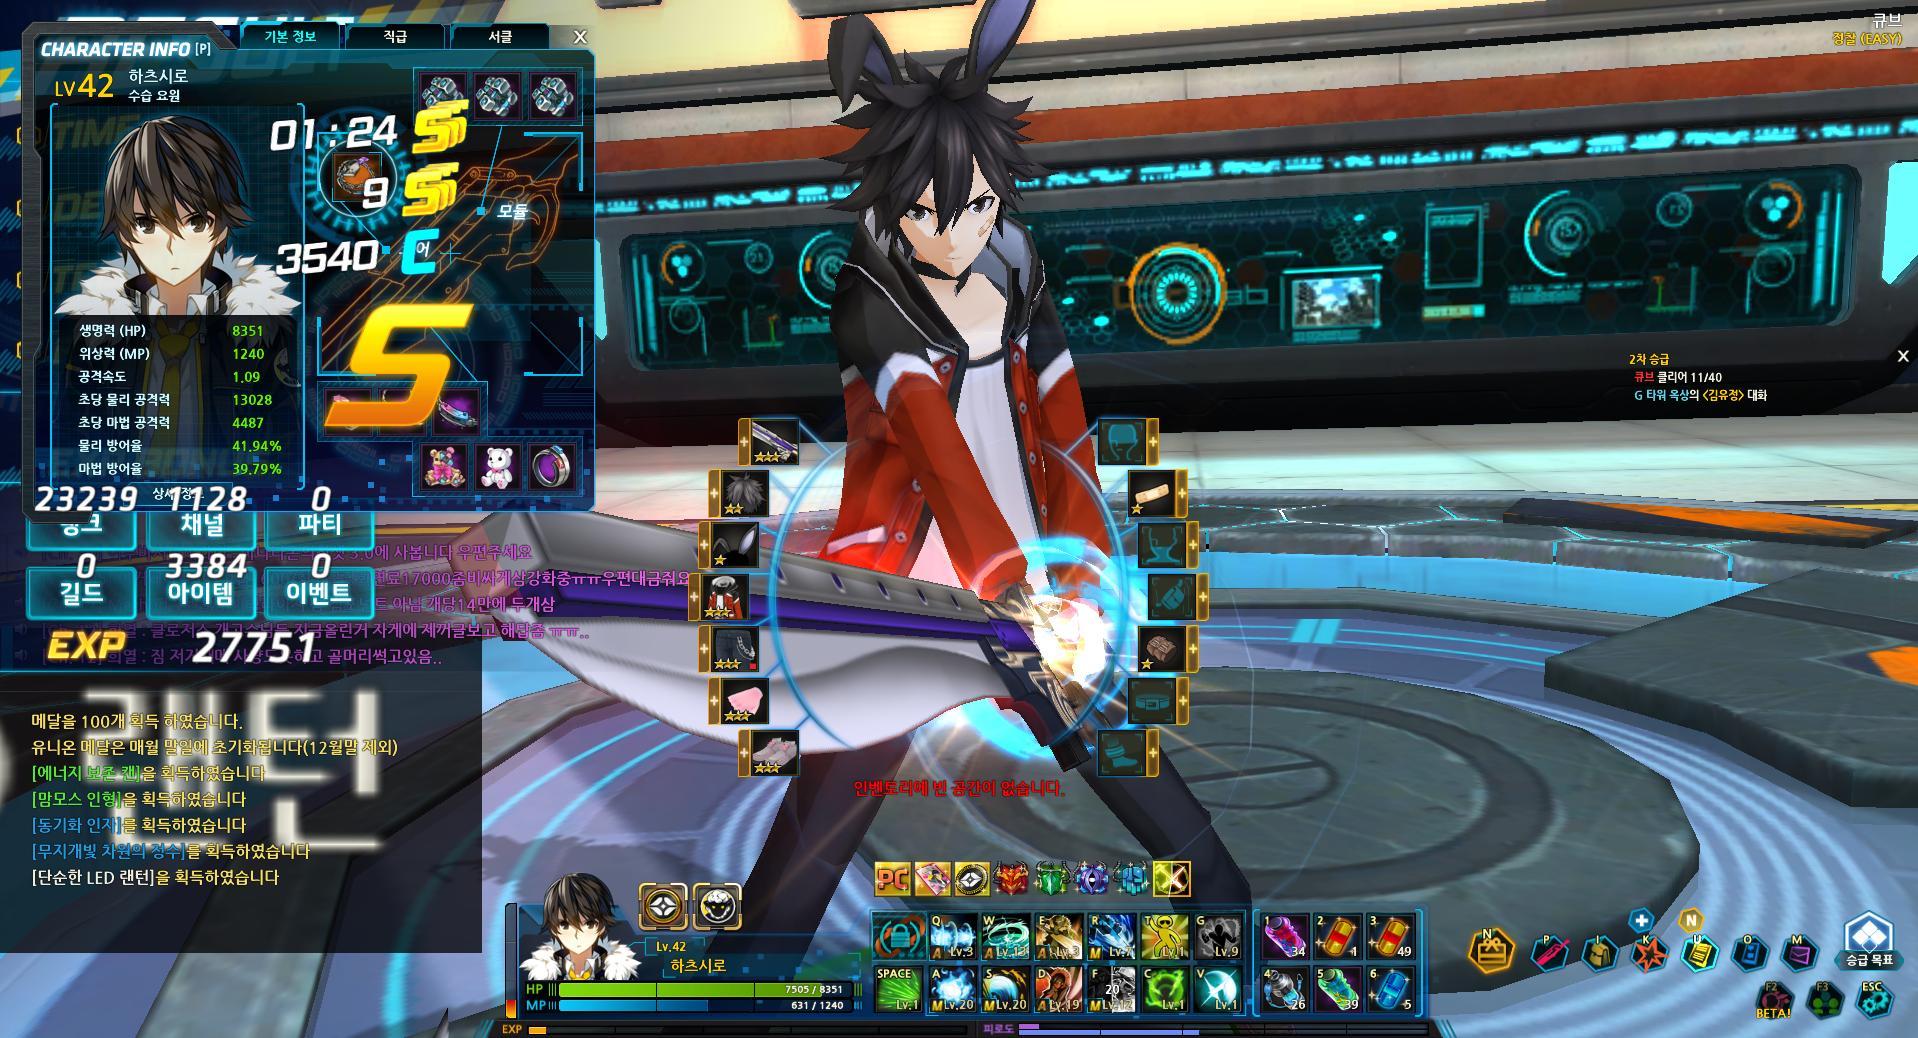 Photo of Megaxus Luncurin Game Teranyar Closers Online